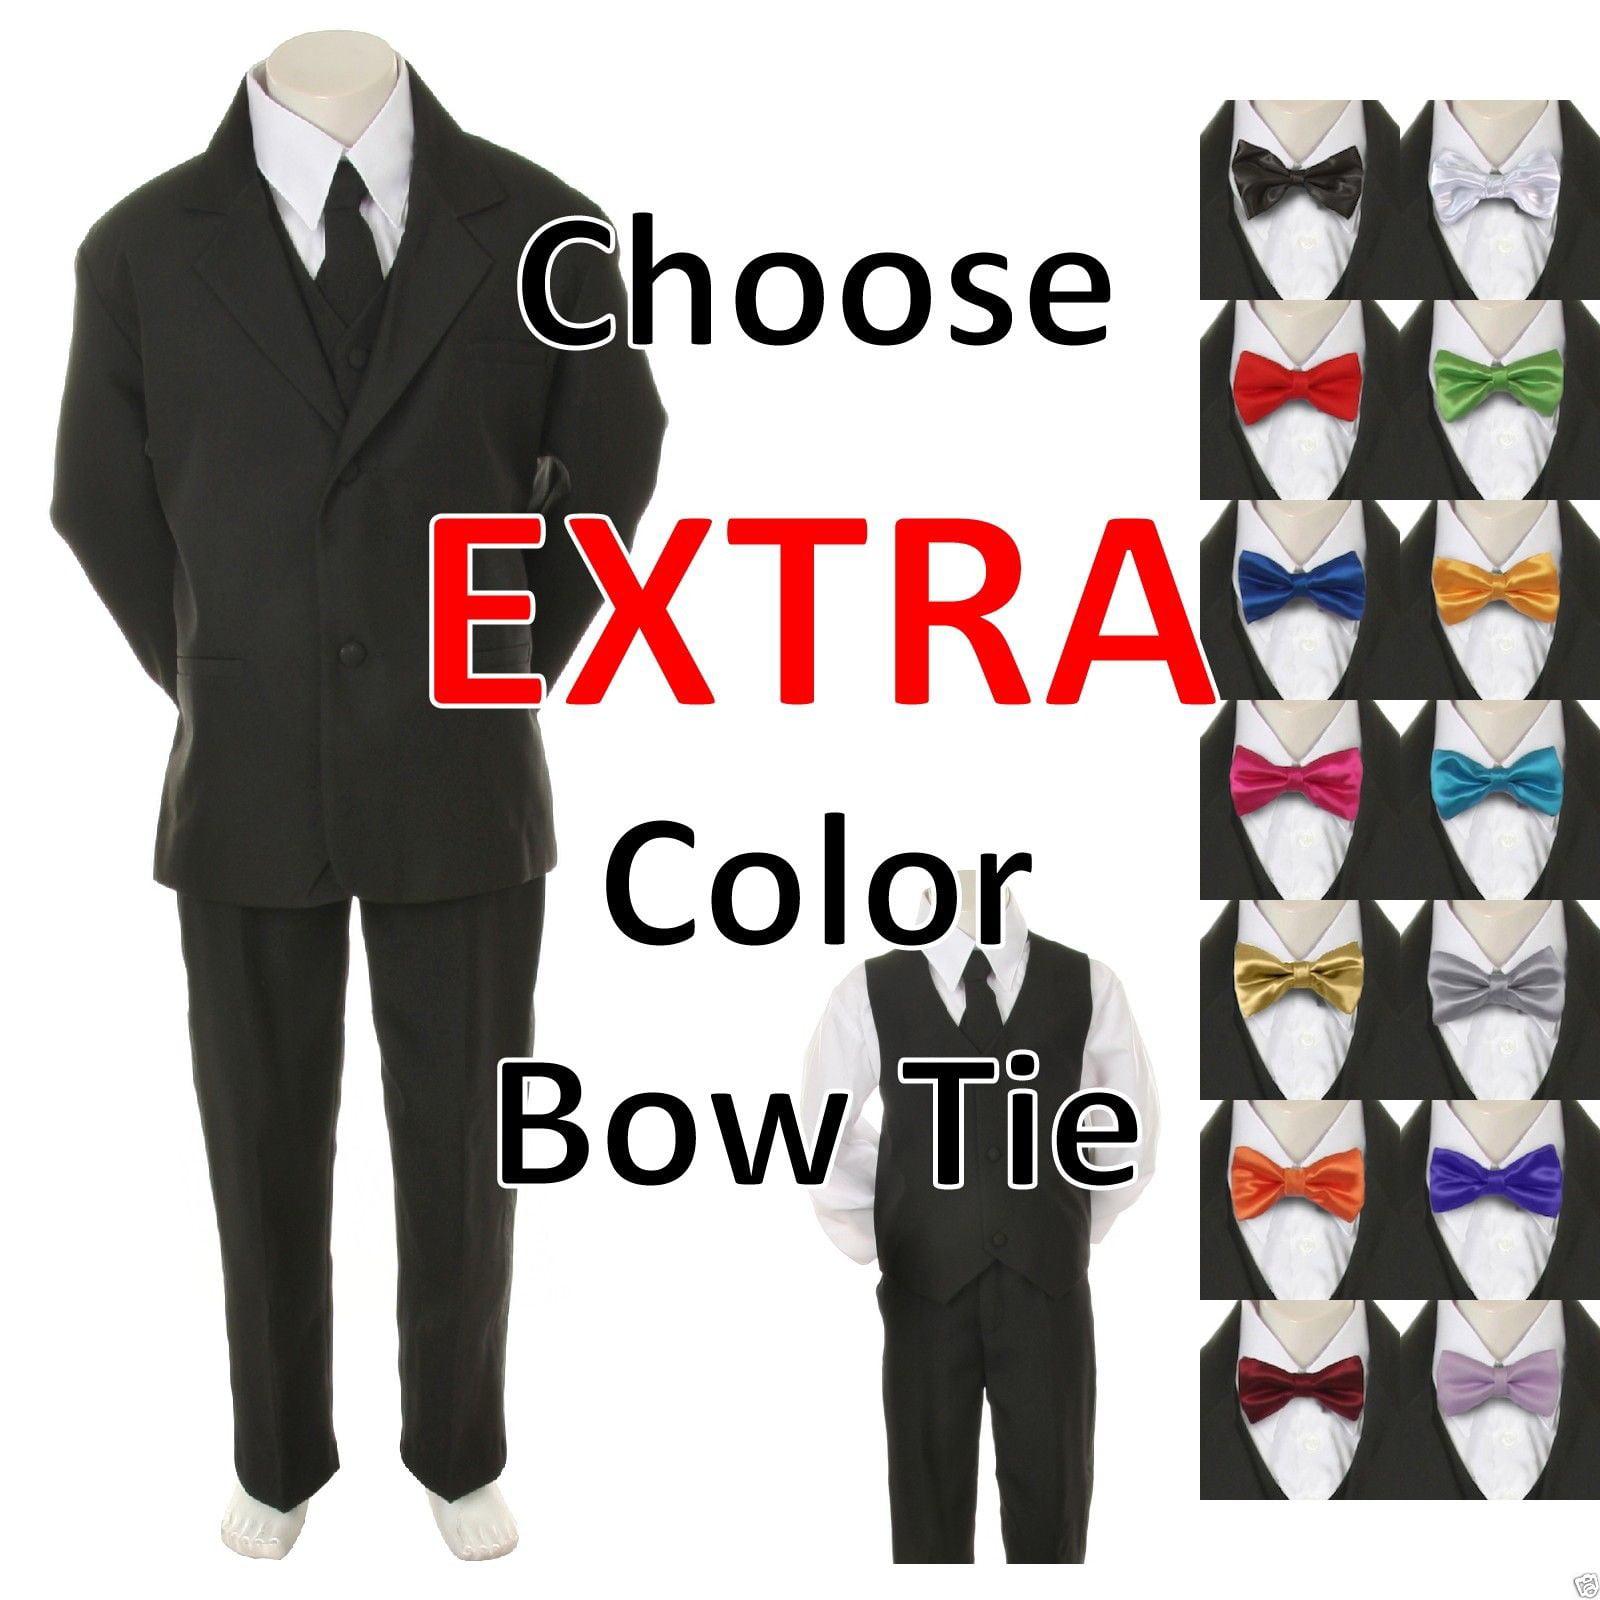 Baby Toddler Kid Formal Wedding 6pc Tuxedo Black Boy Suit Tie 14 Color sz S-20